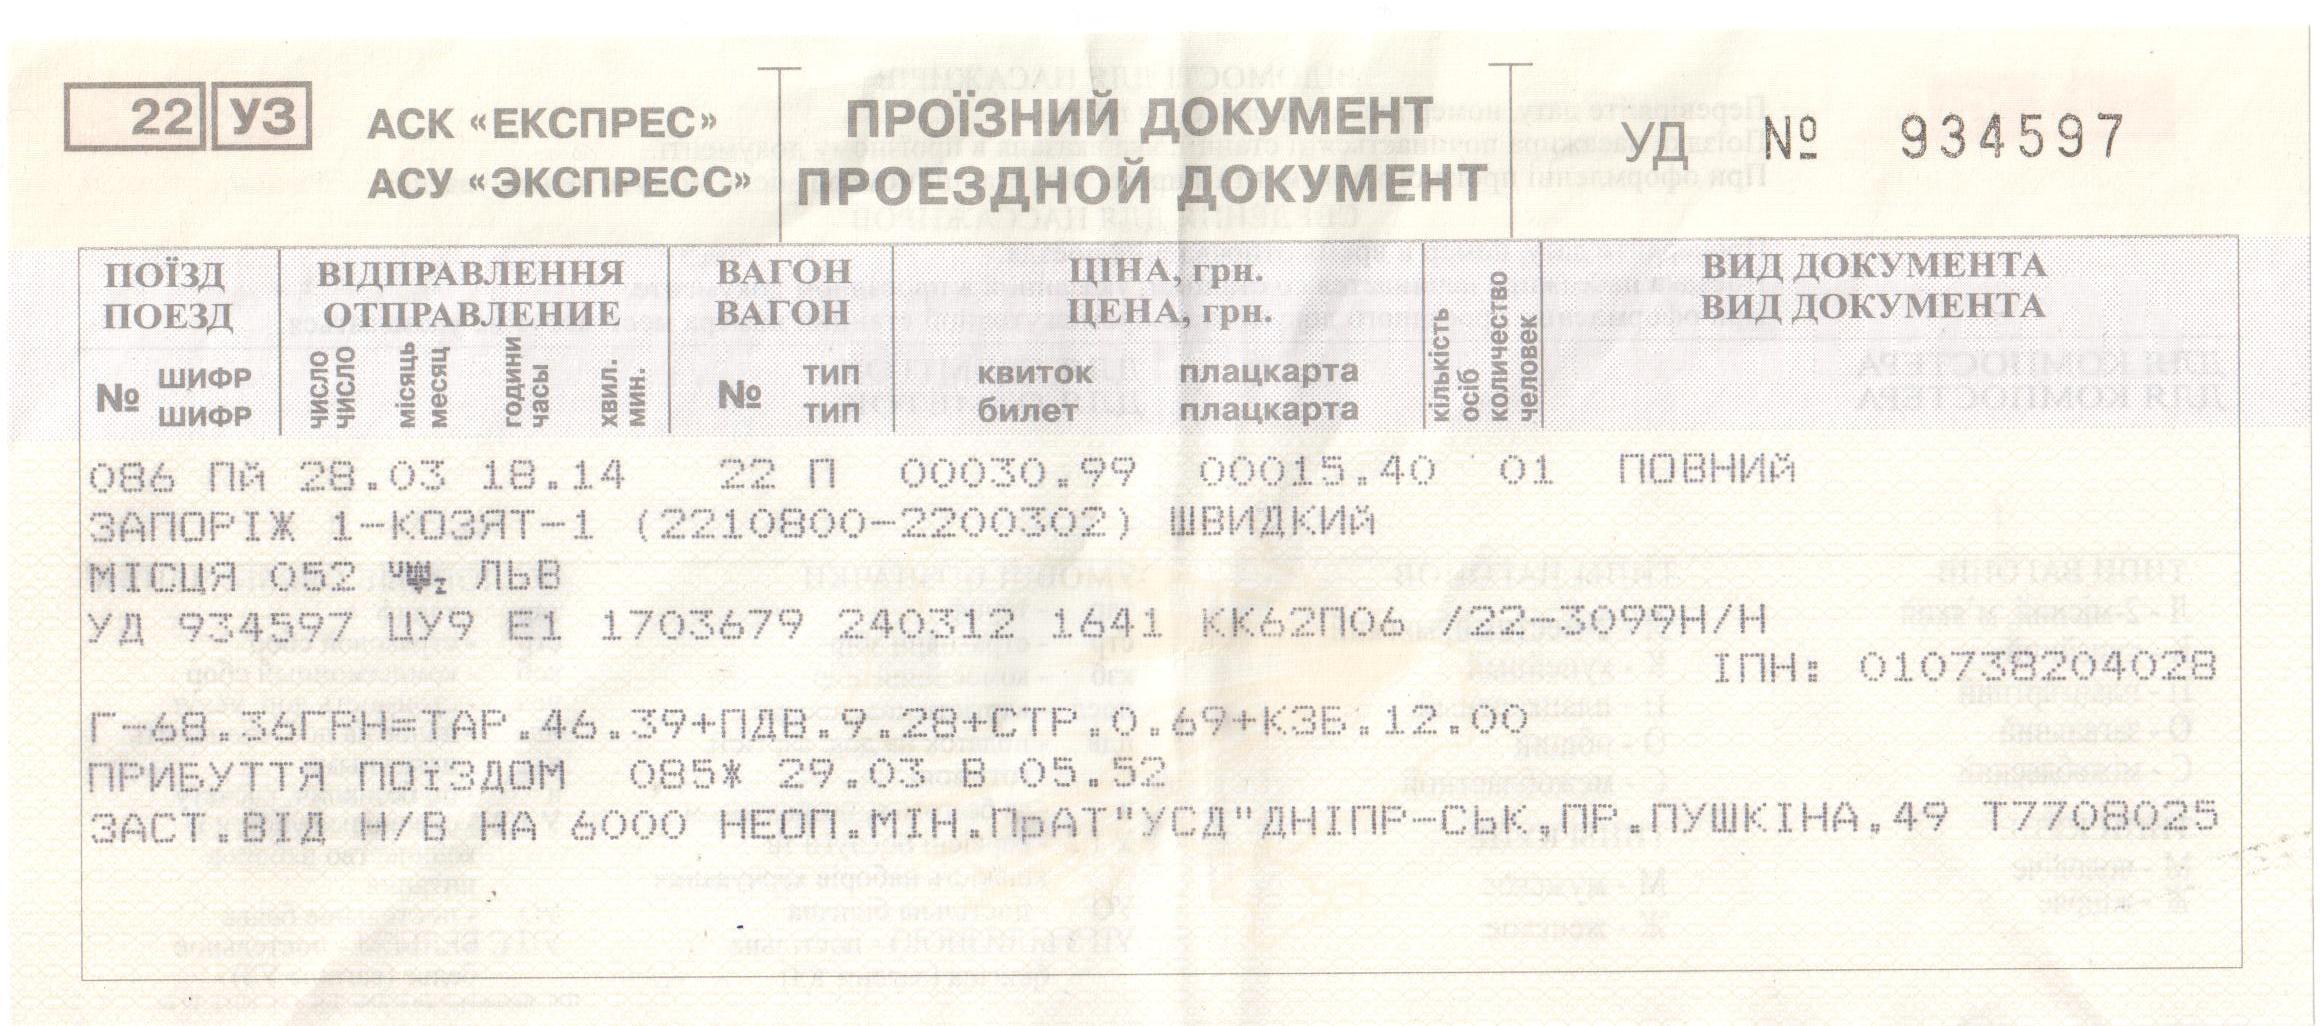 Шкафы на заказ в москве и области на